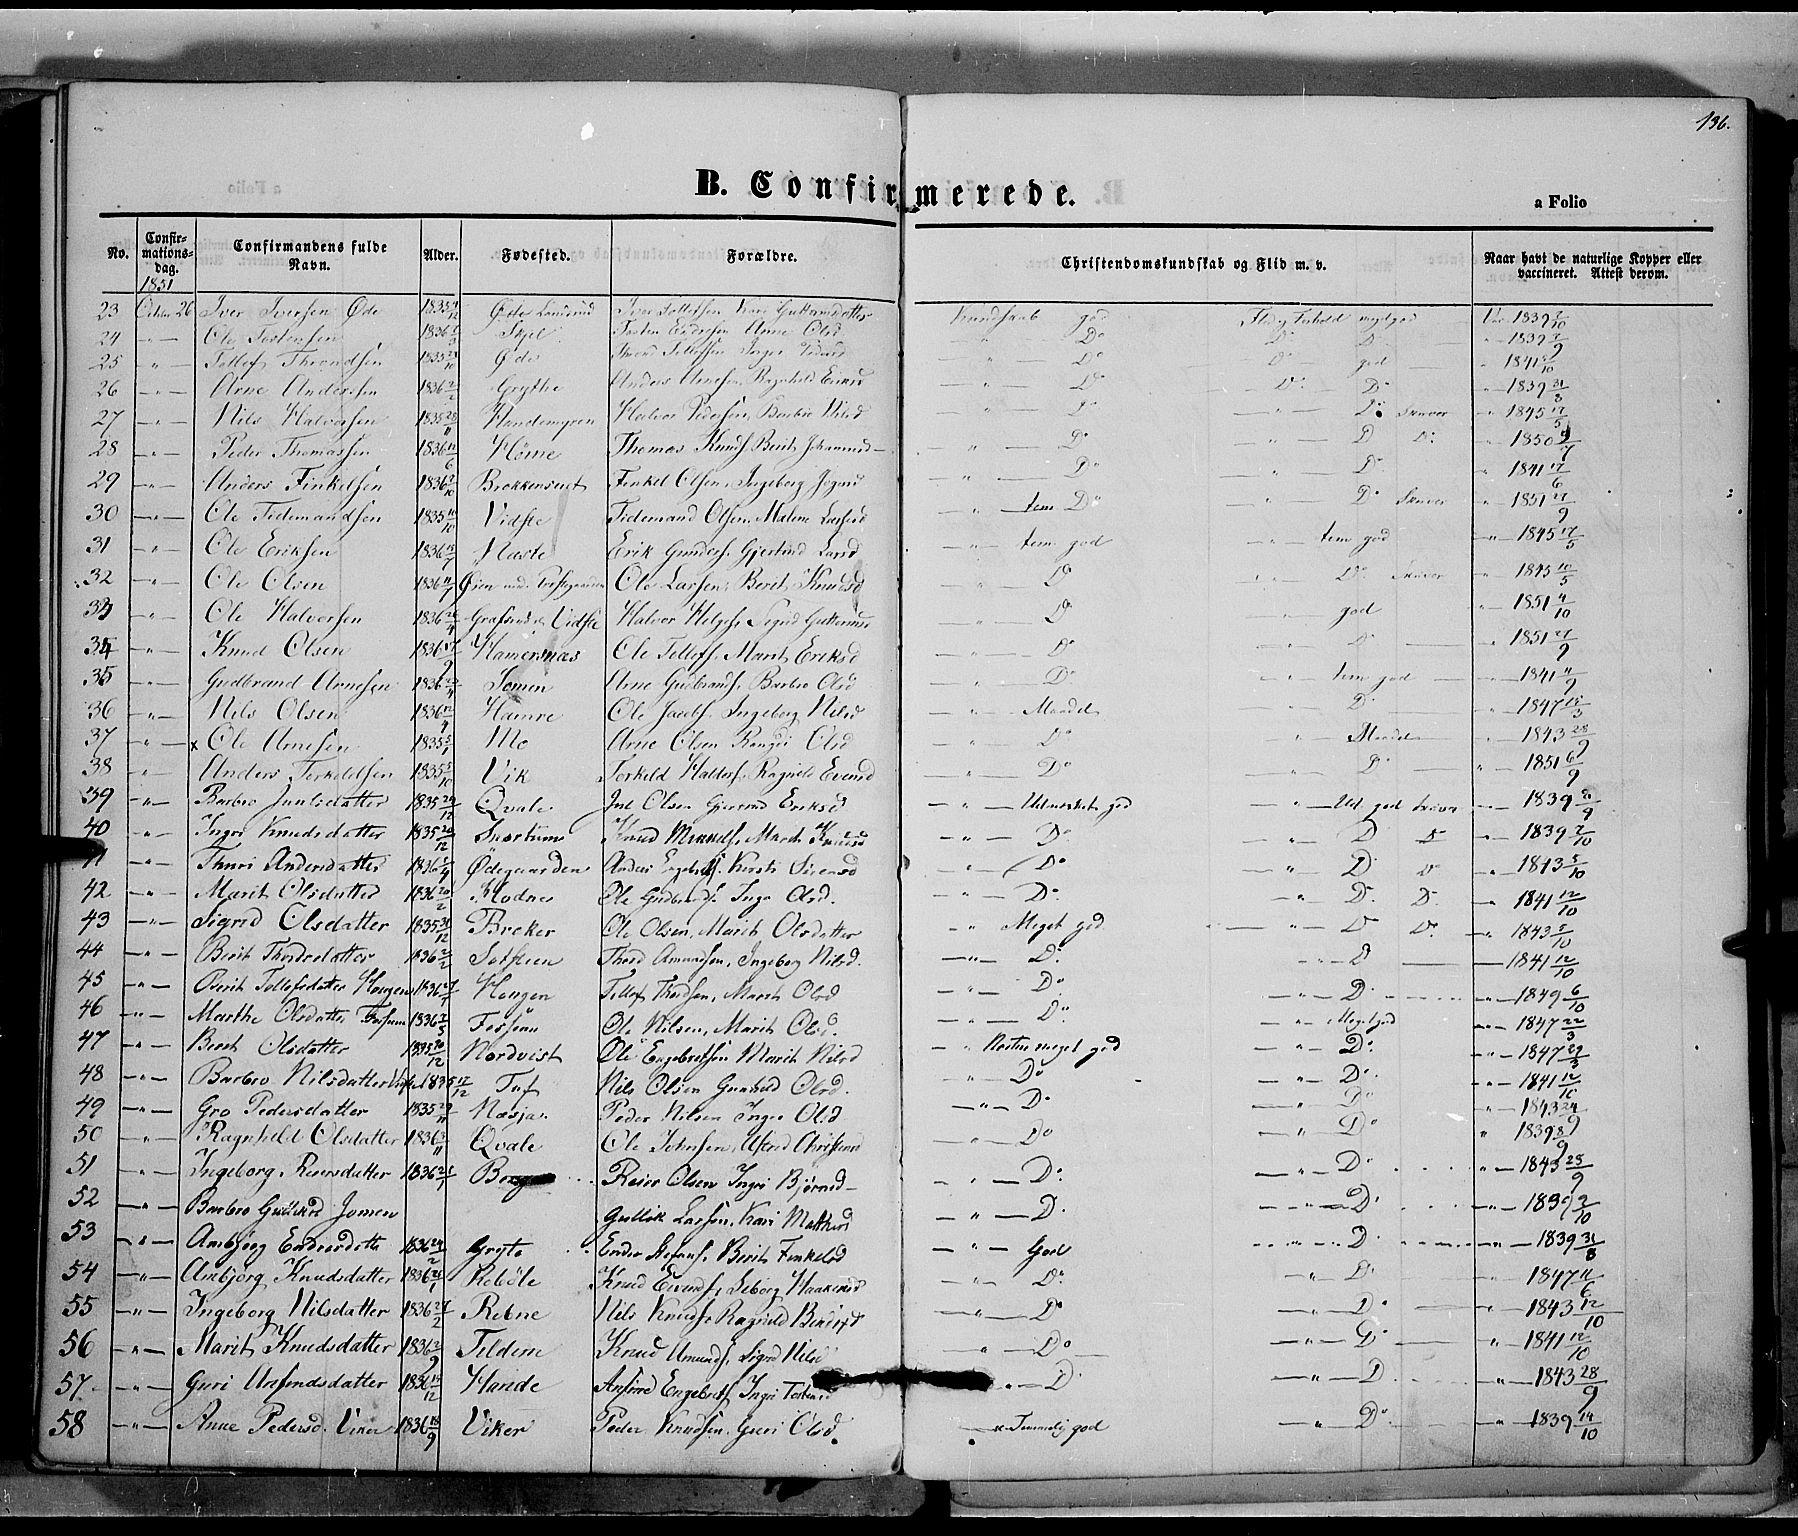 SAH, Vestre Slidre prestekontor, Ministerialbok nr. 1, 1844-1855, s. 136